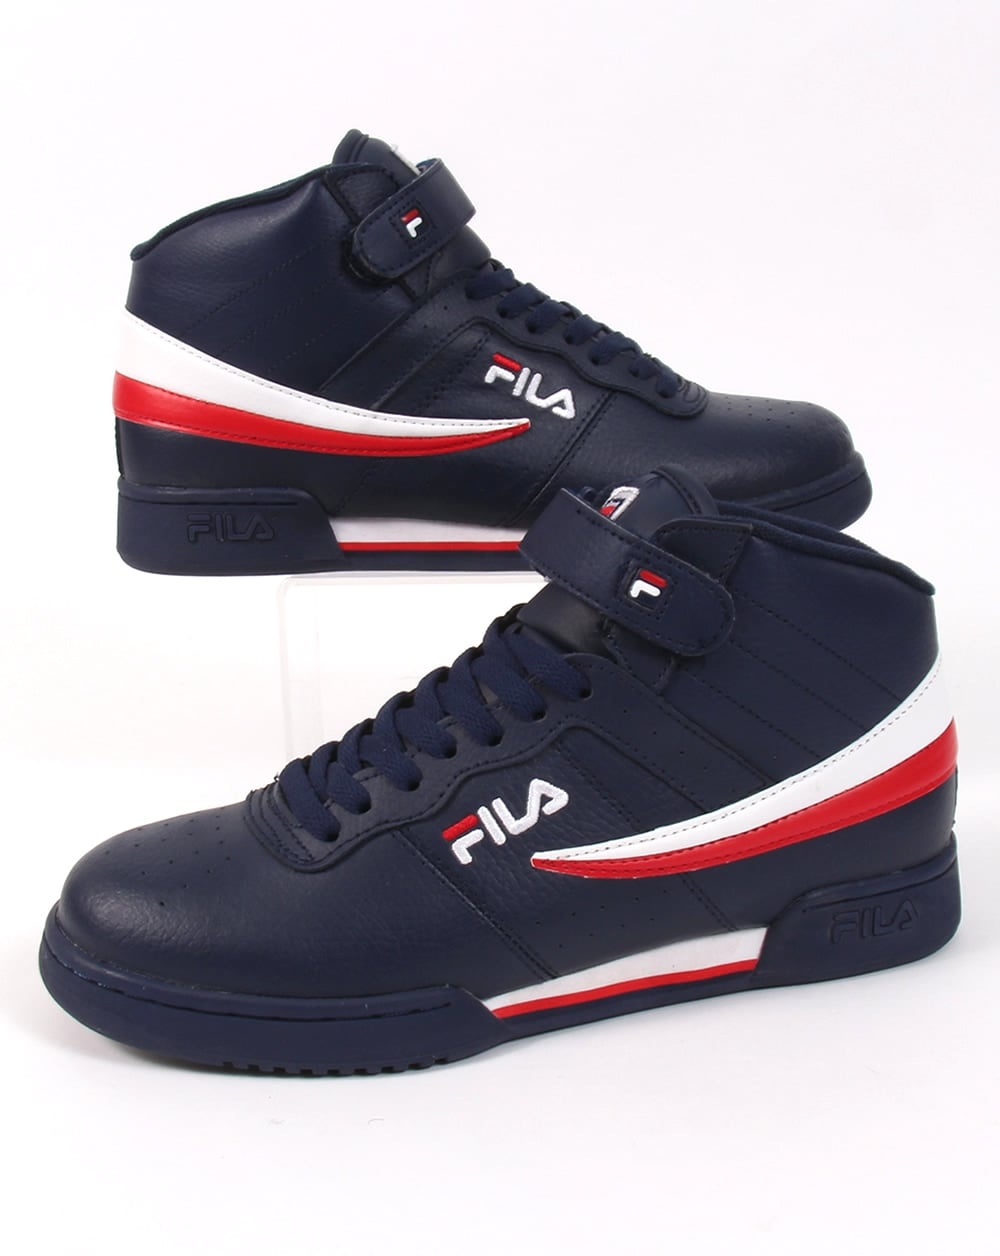 Fila Vintage Shoes